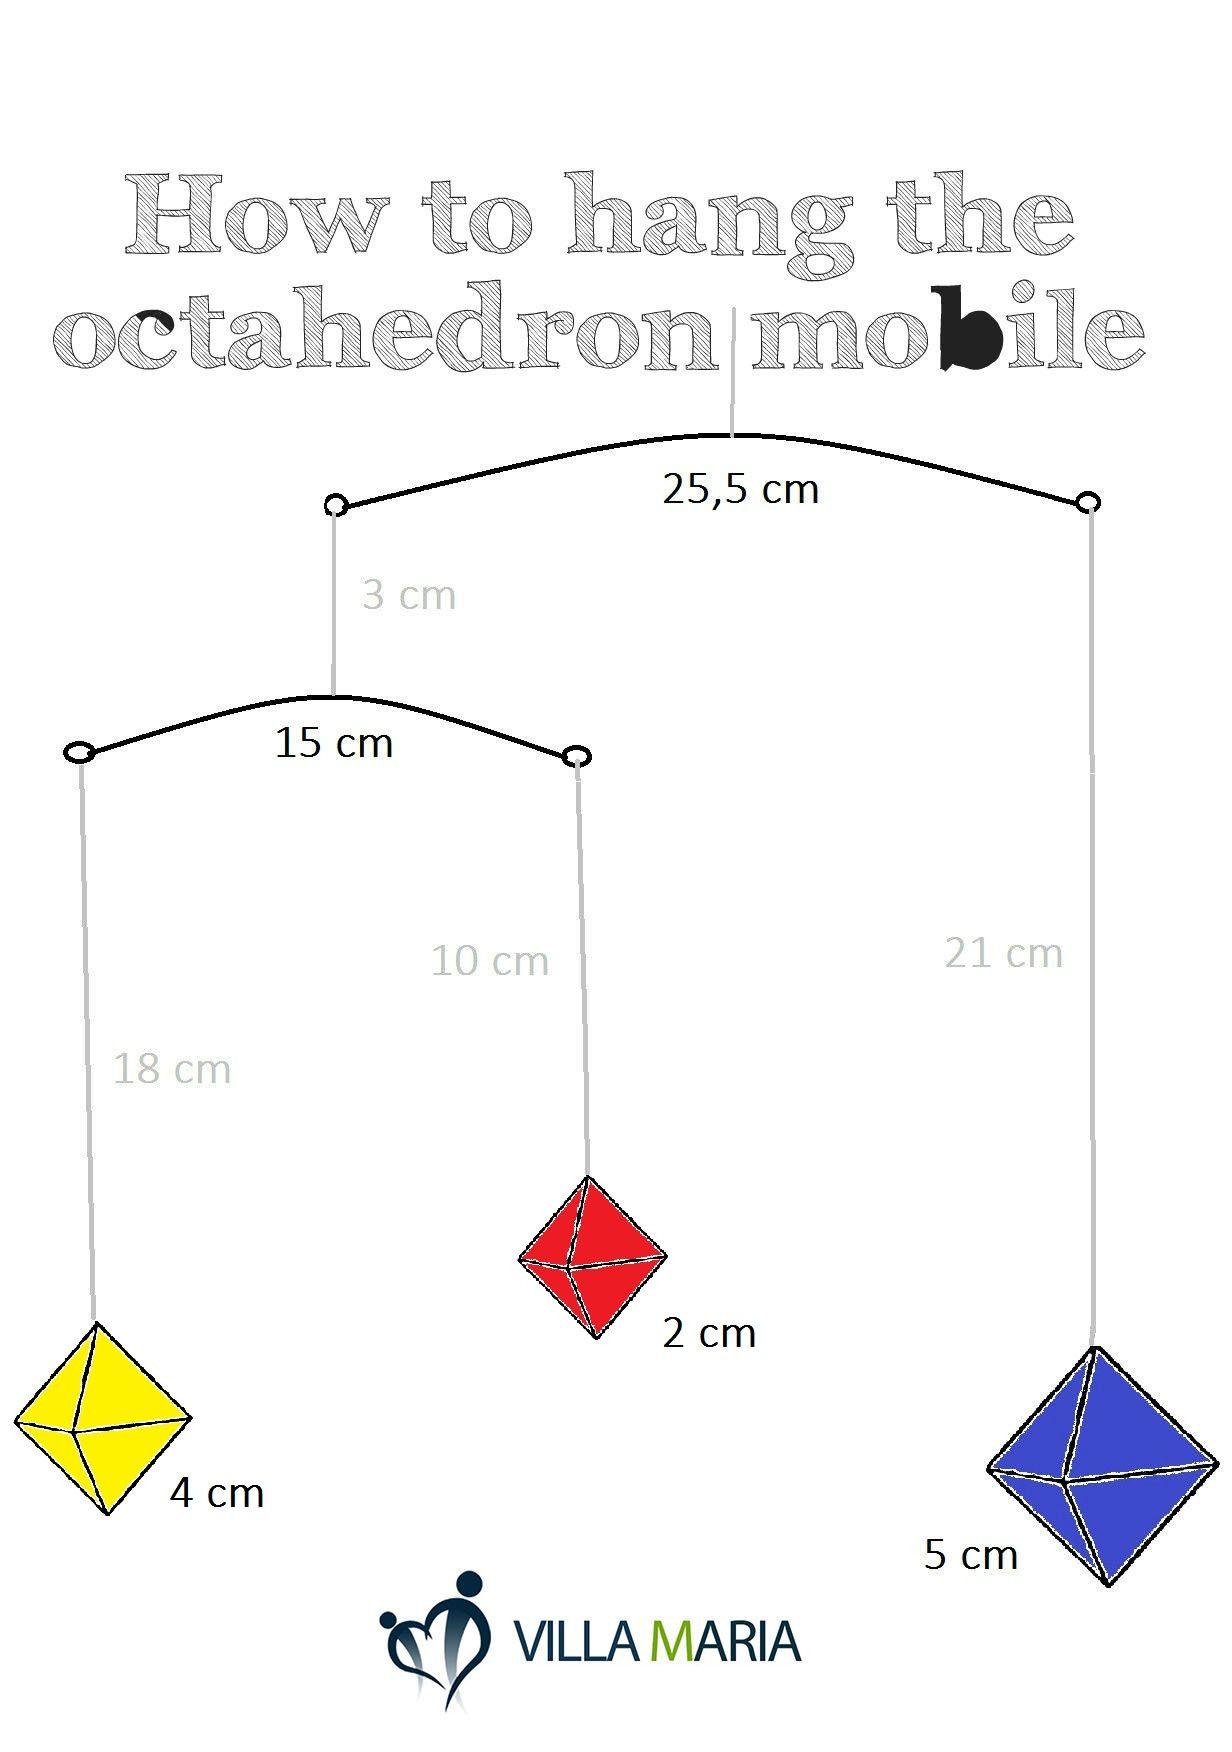 Oktaedri montessori mobili montessori toys montessori for Mobili montessori